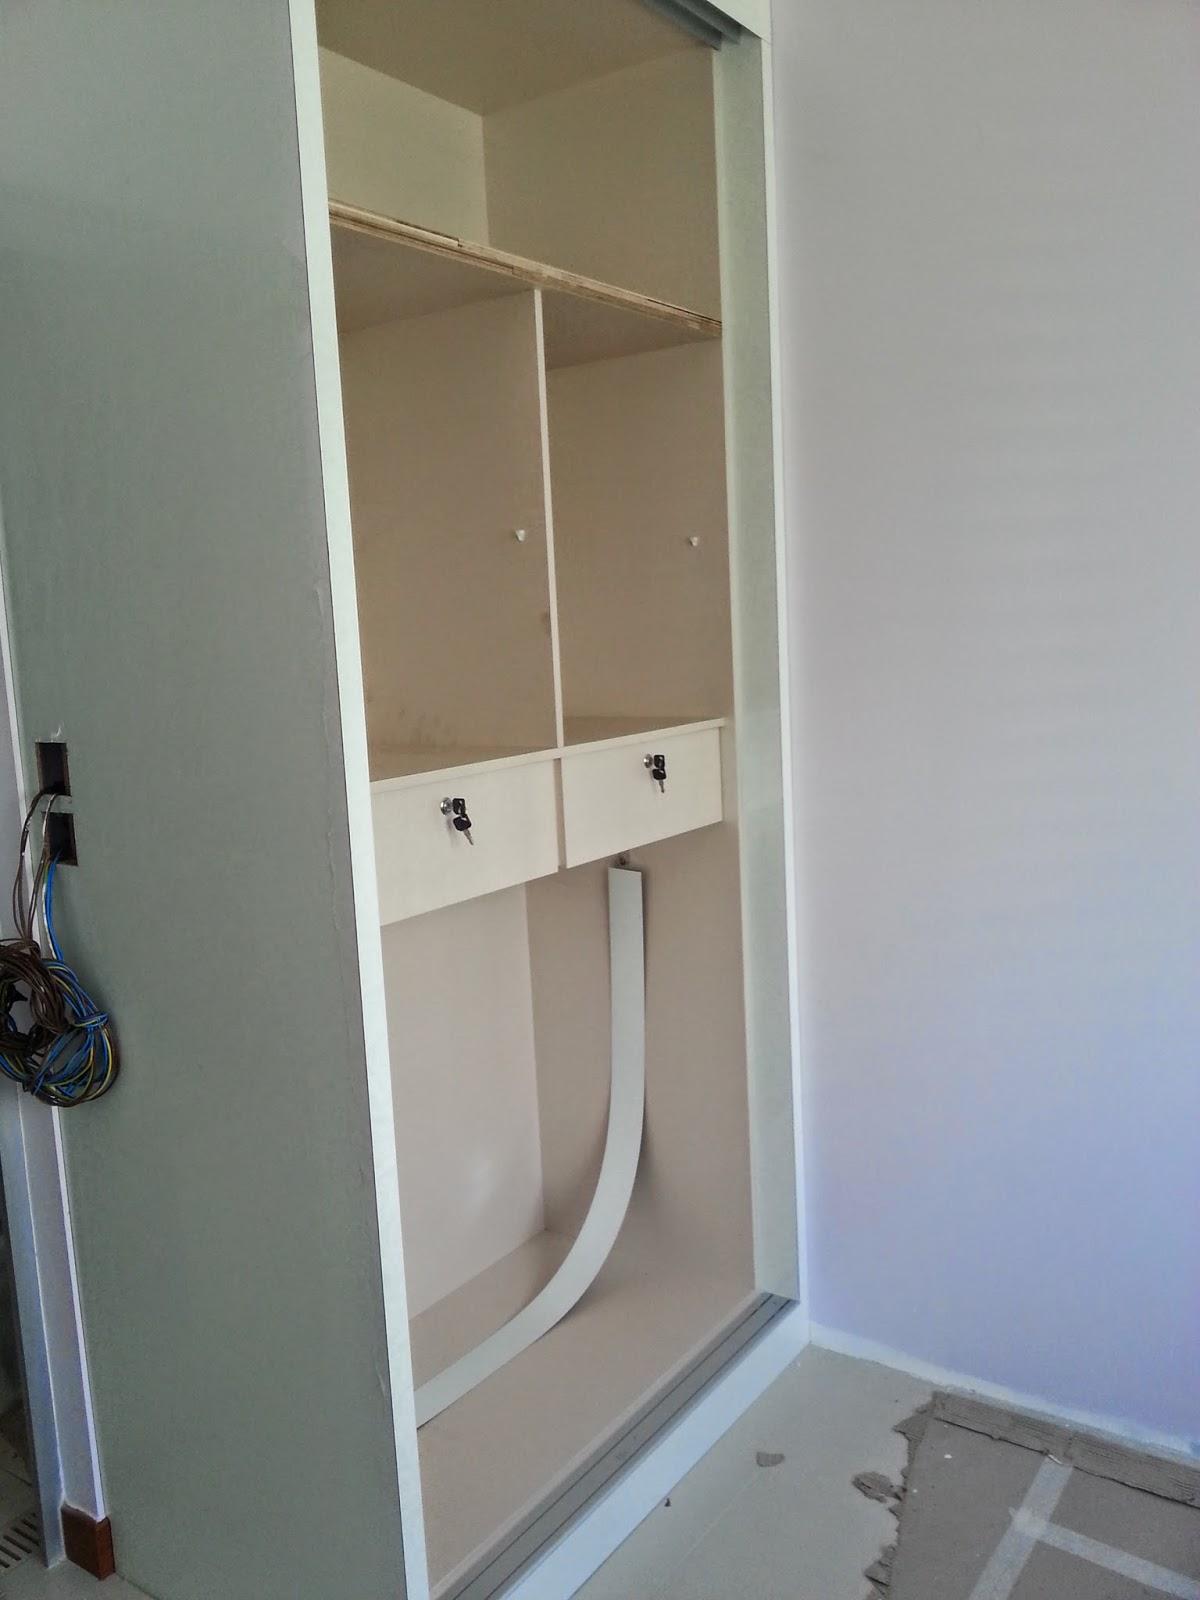 HDB 2 room BTO renovation small space ,big ideas